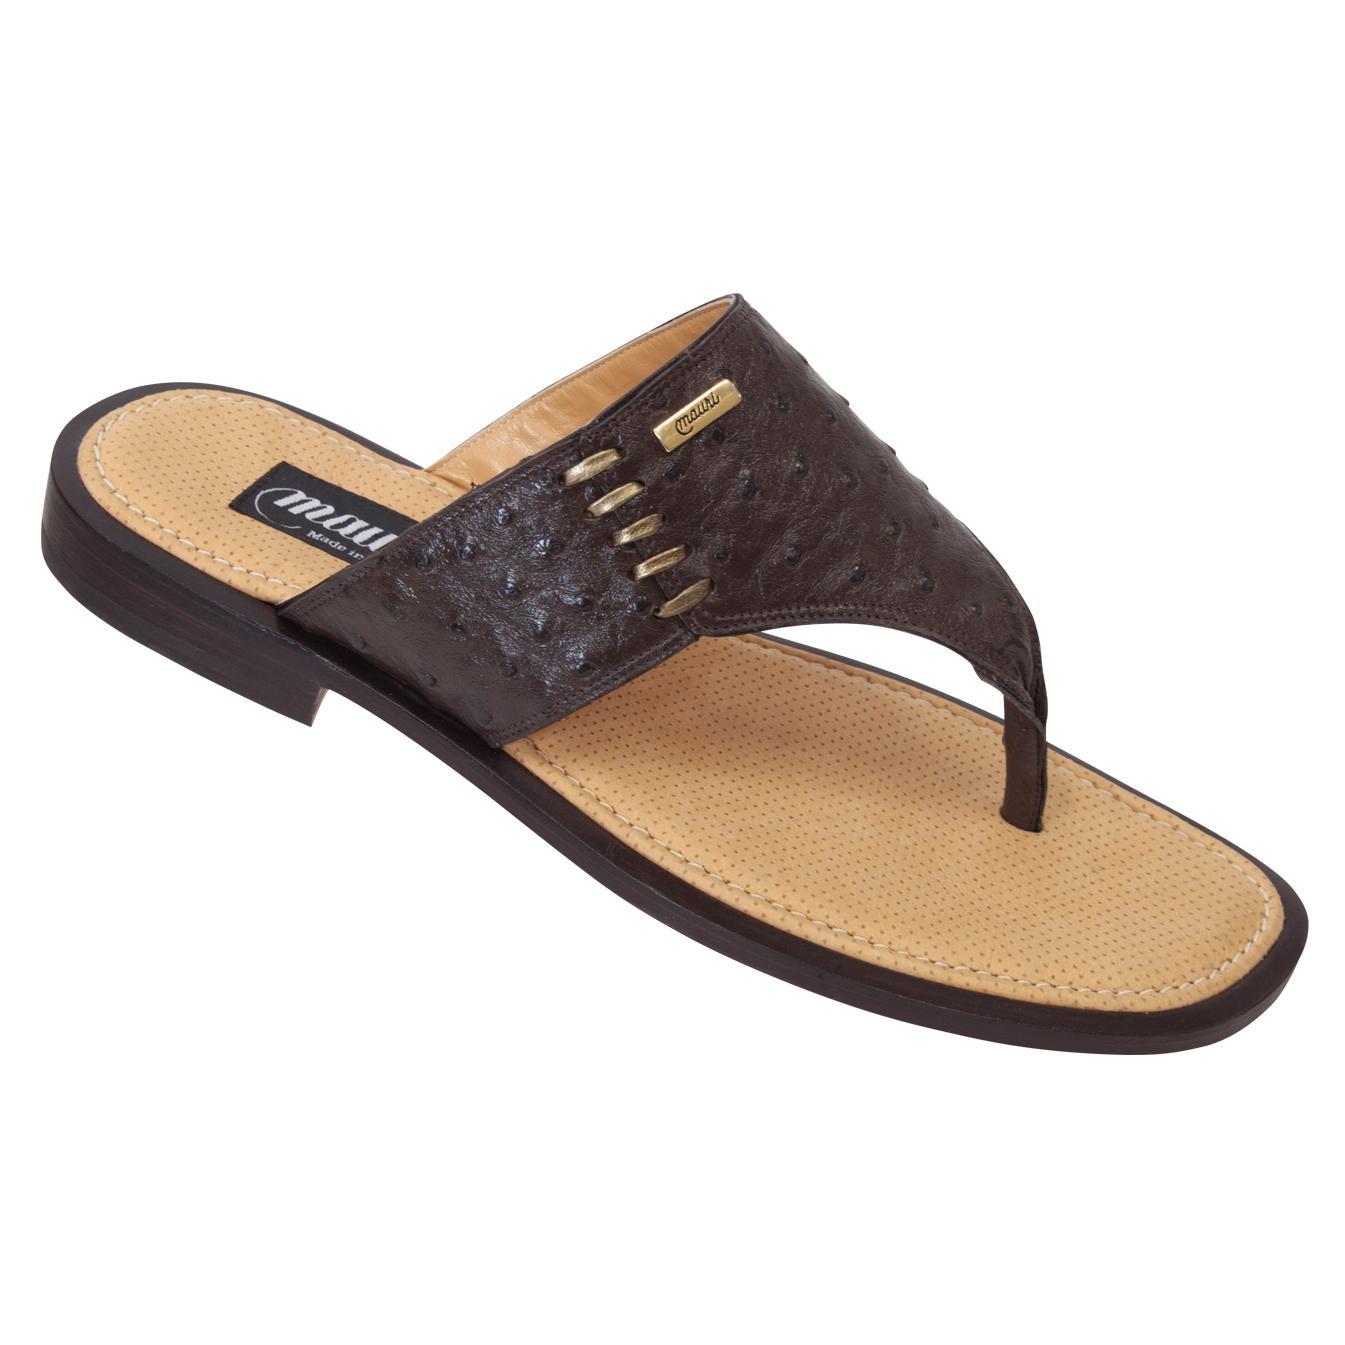 Mauri 1835 Nicotina Genuine Ostrich Sandals 649 90